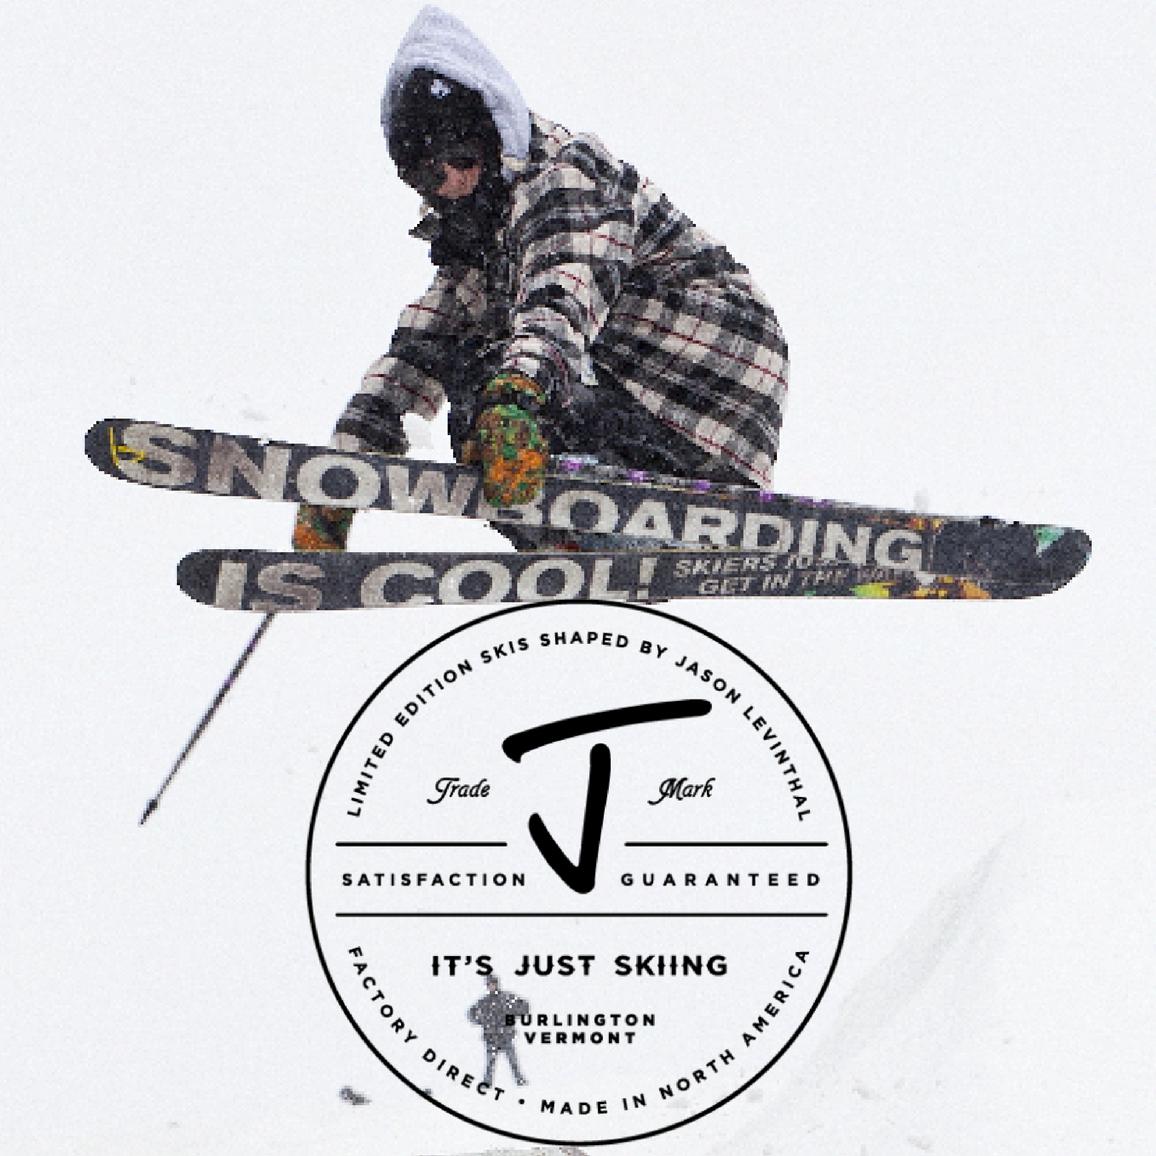 J Skis Brand Image.jpg